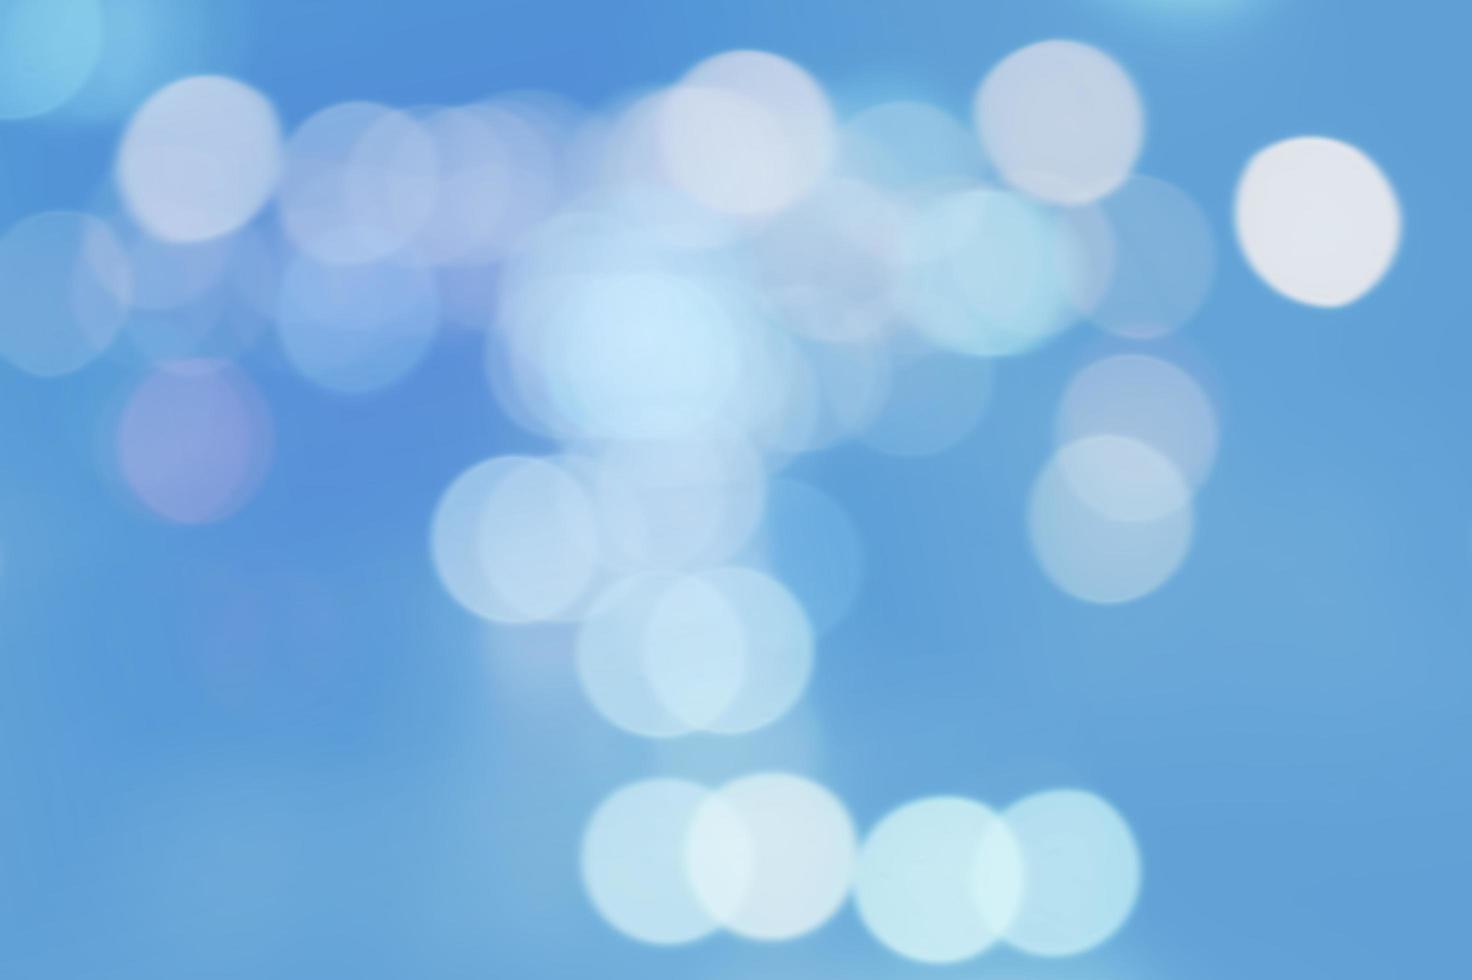 Abstract blue bokeh photo